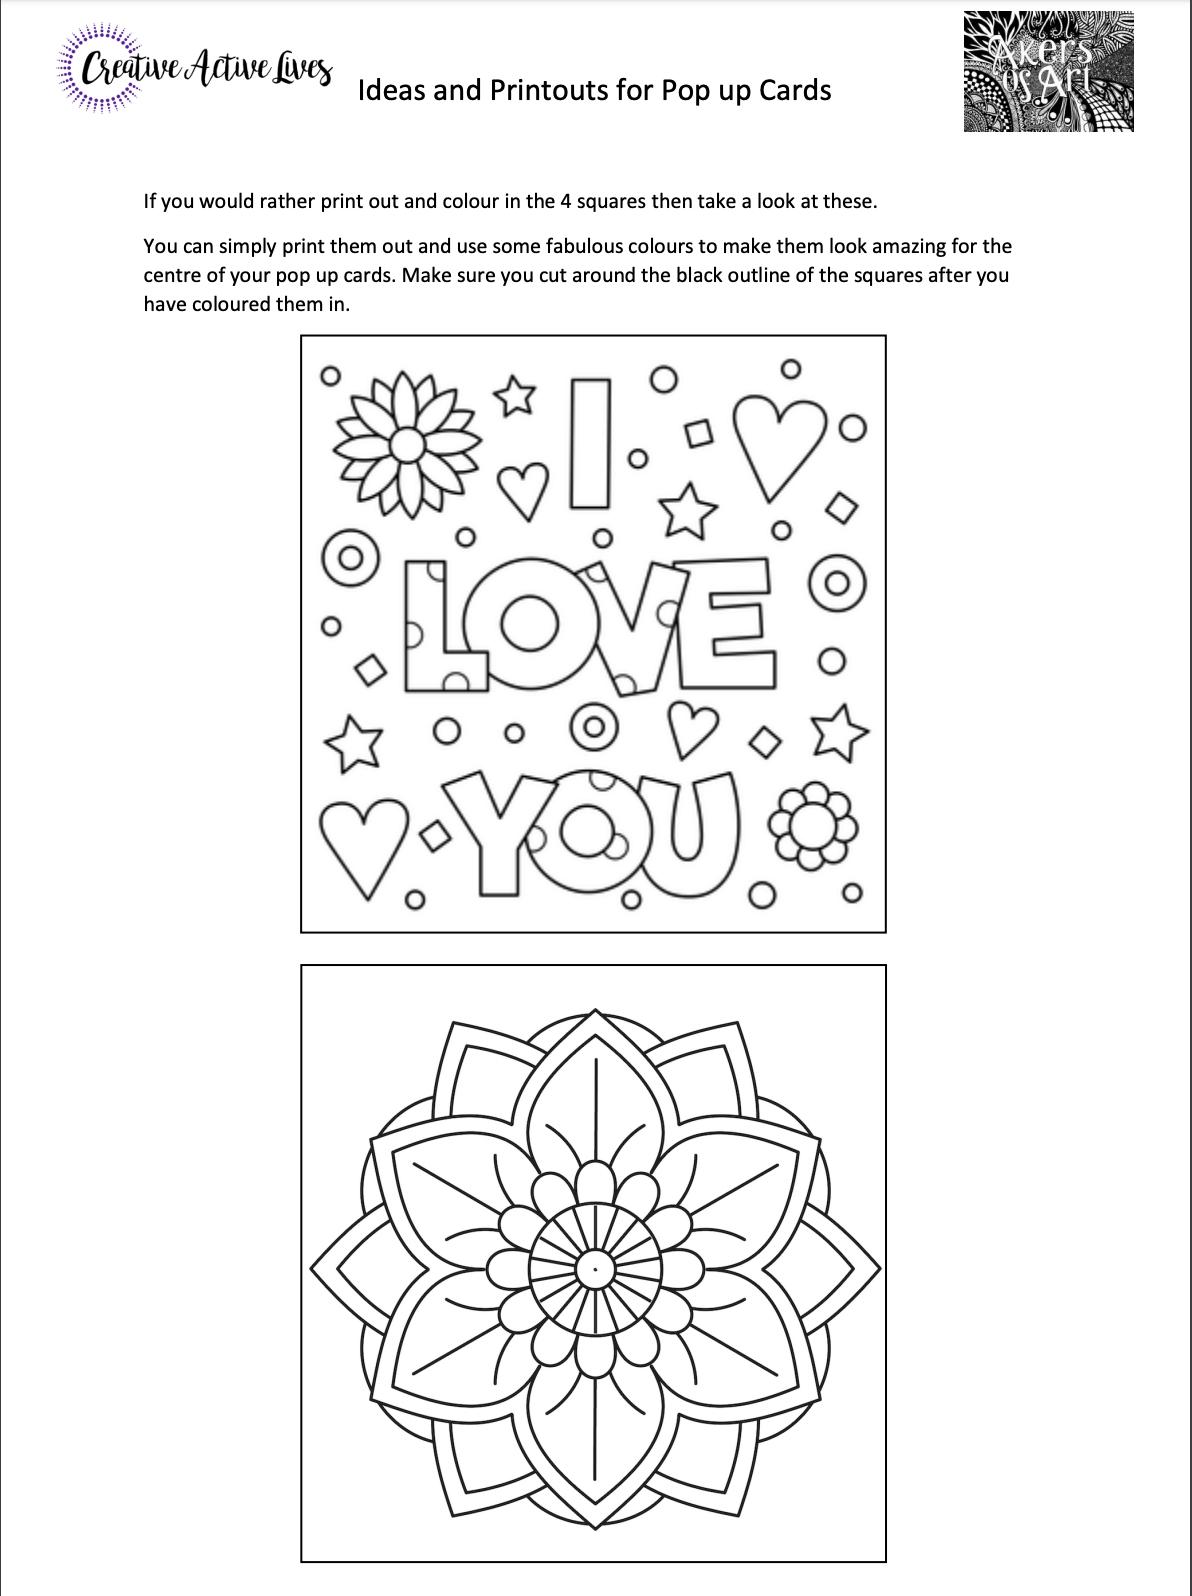 How To Make A I Love U Pop Up Card Valentine S Day Pop Up Card Tutorial Card Tutorial Card Making Videos Valentine S Day Diy